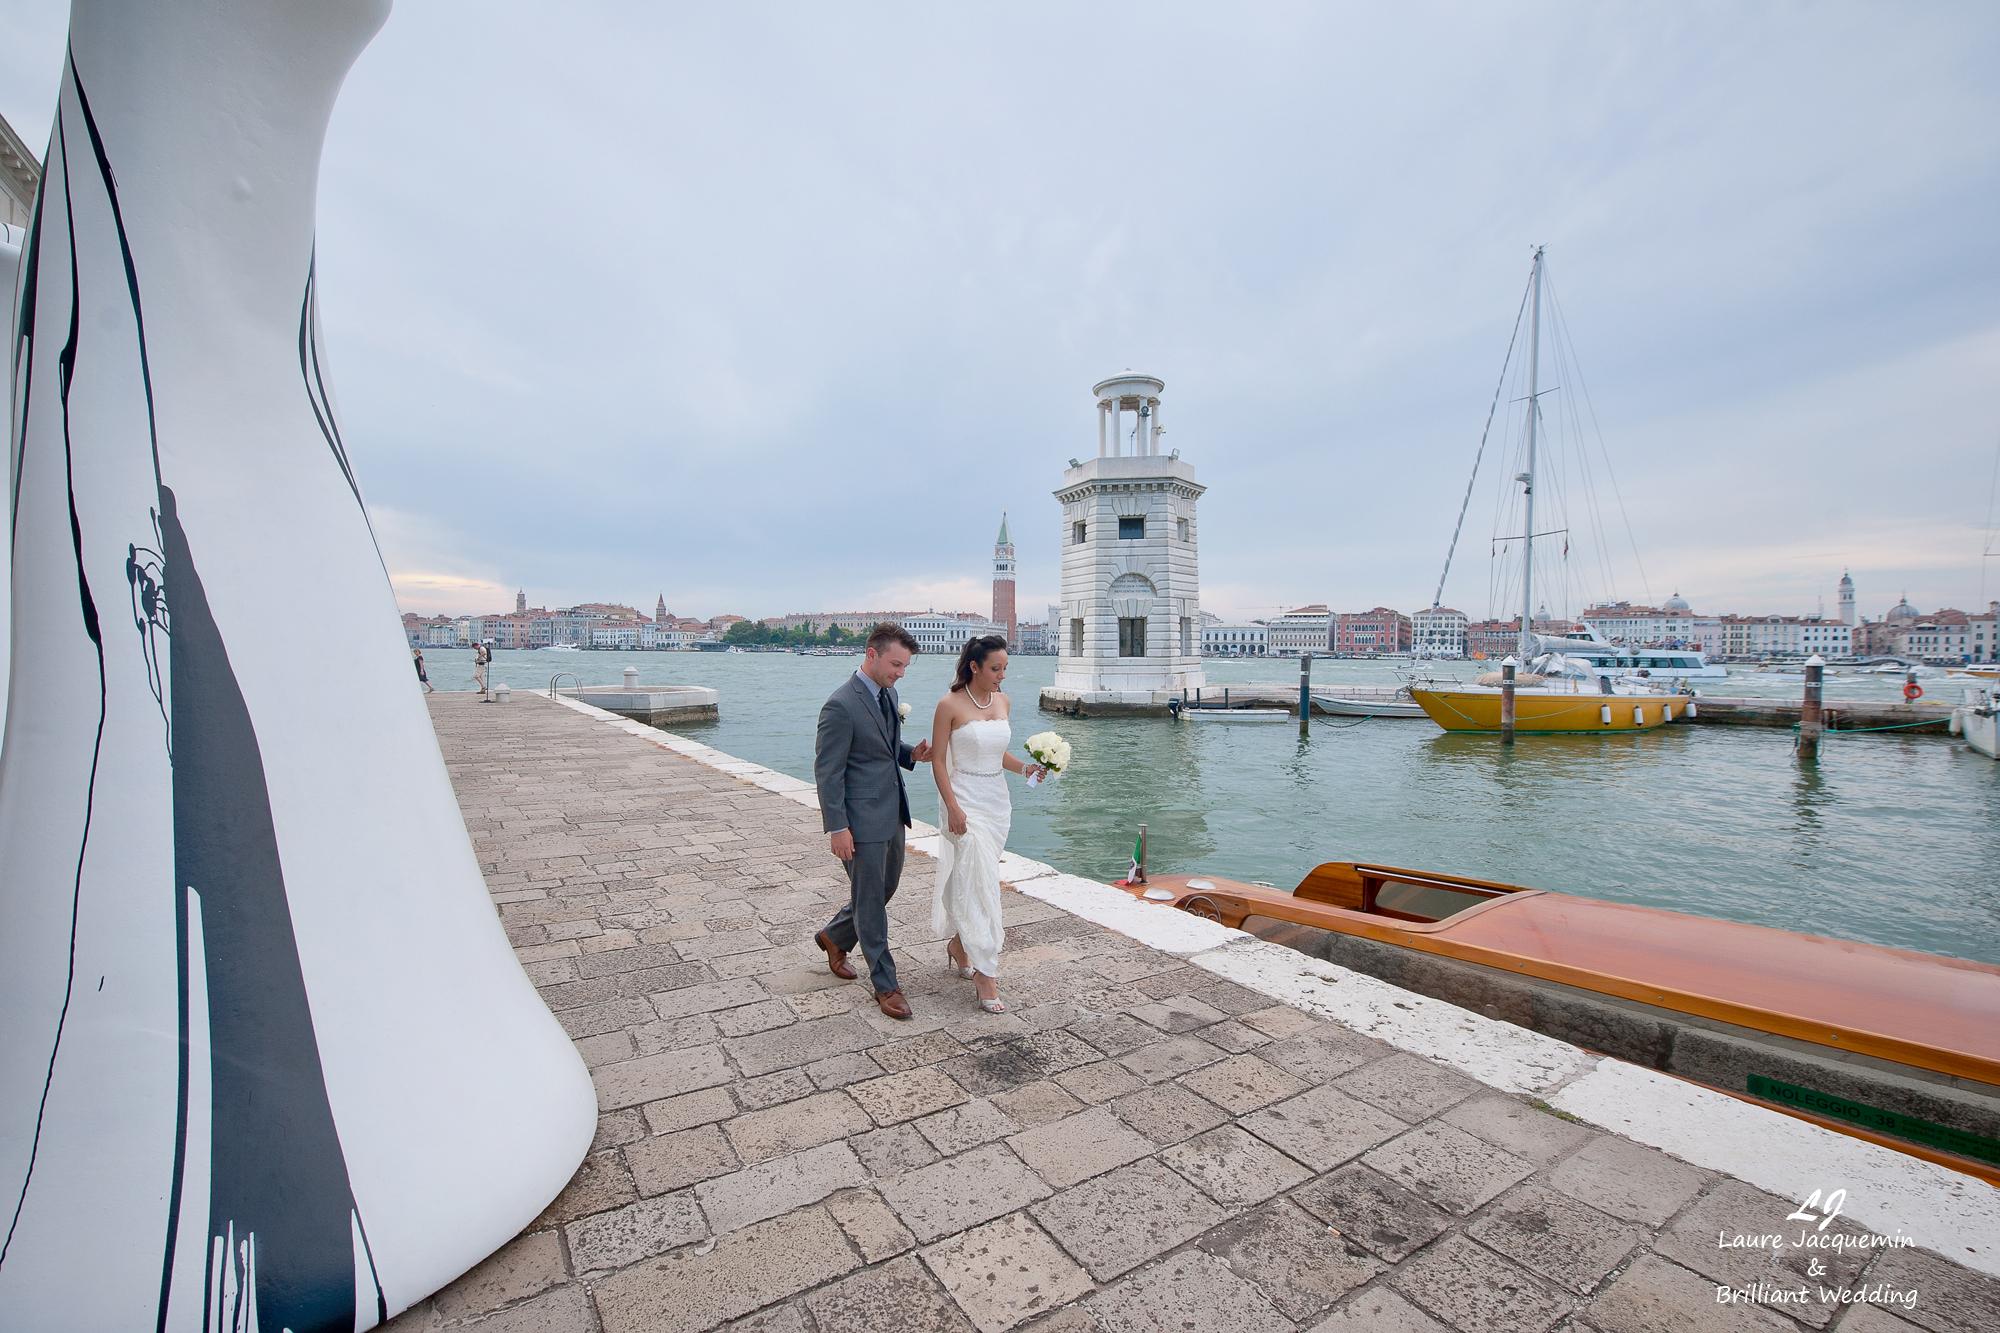 Venice Simbolic Wedding gondola venice Italy laure jacquemin photography (77) copia